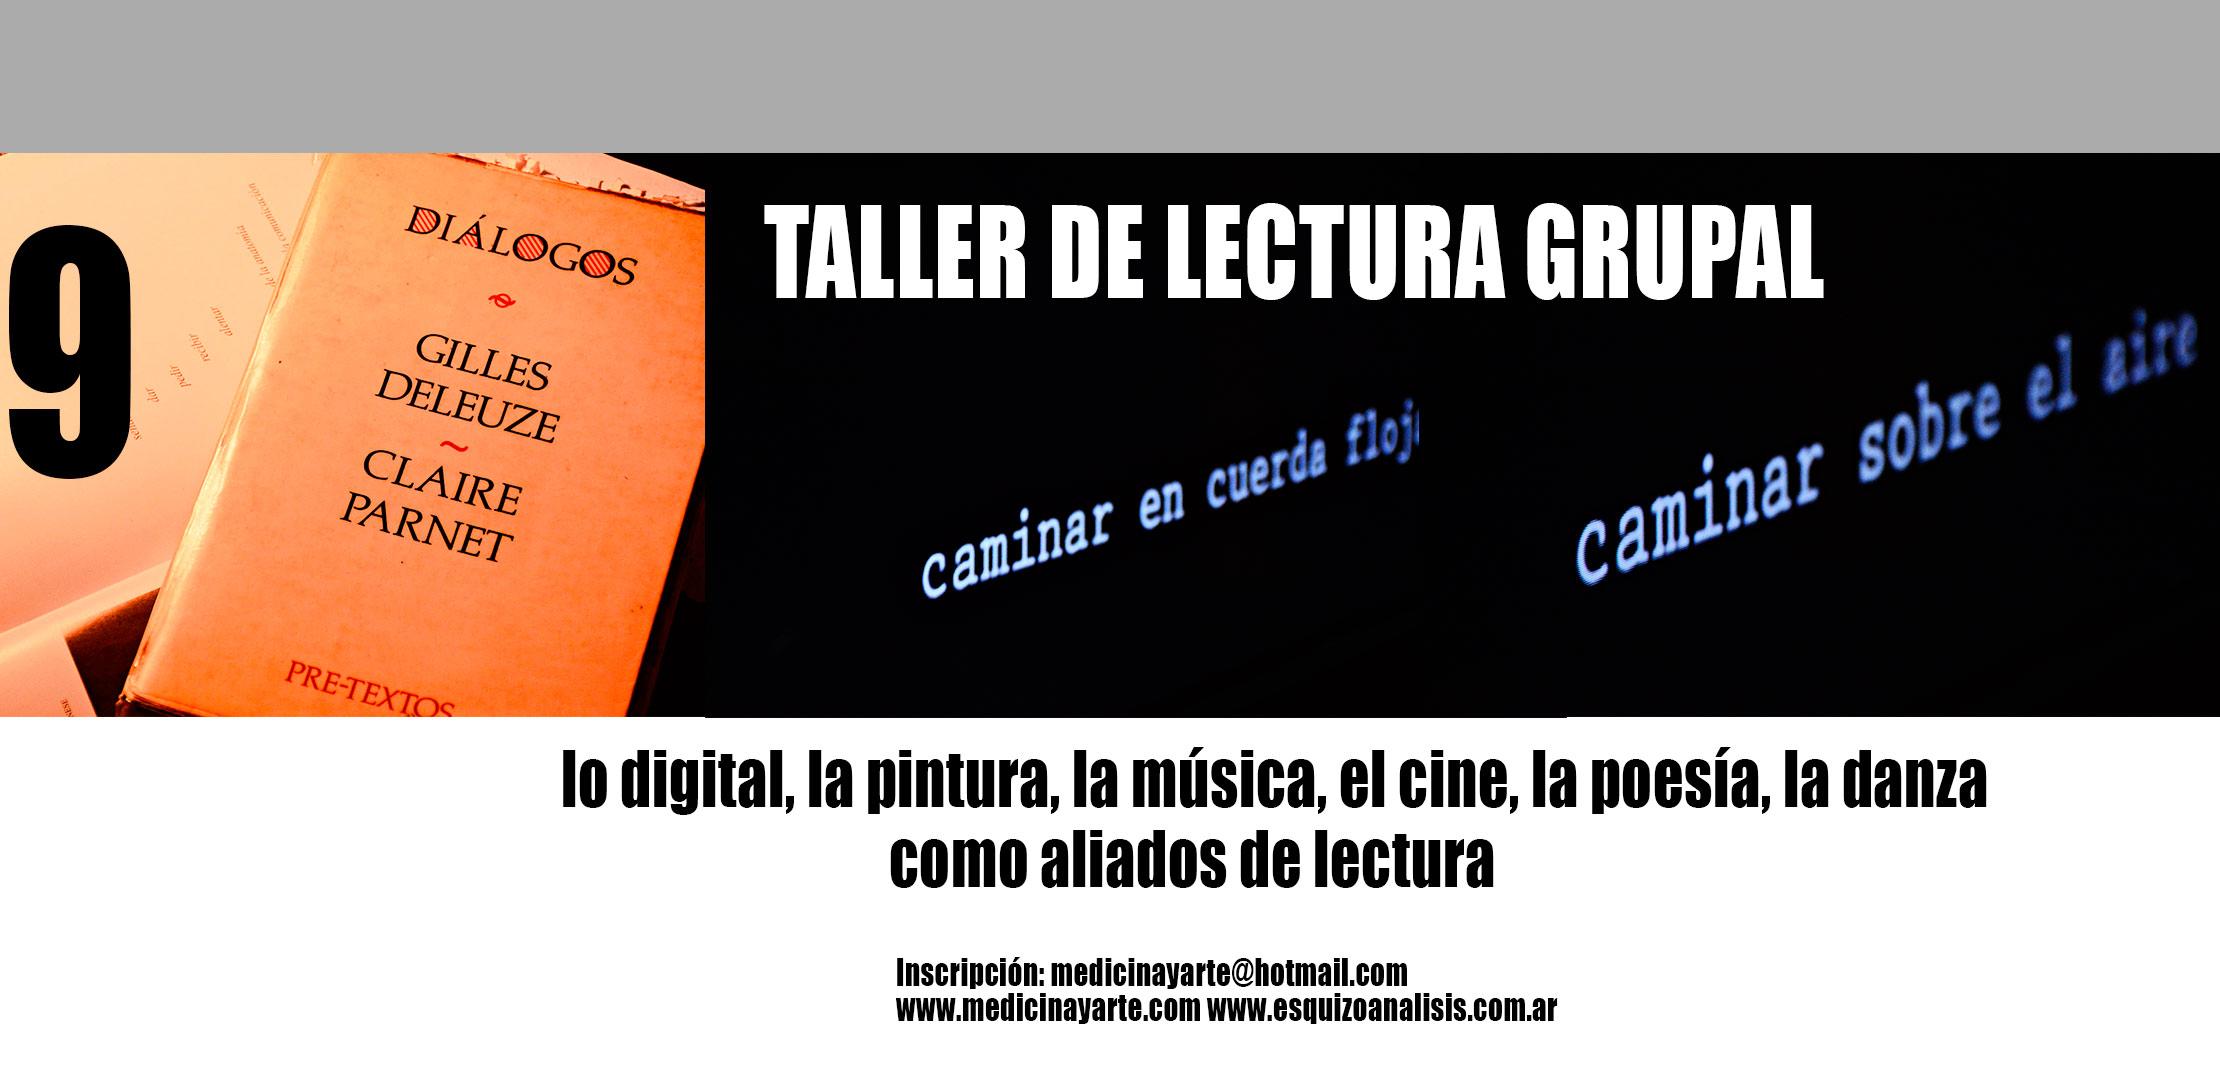 http://medicinayarte.com/img/taller-de-lectura-grupal.jpg